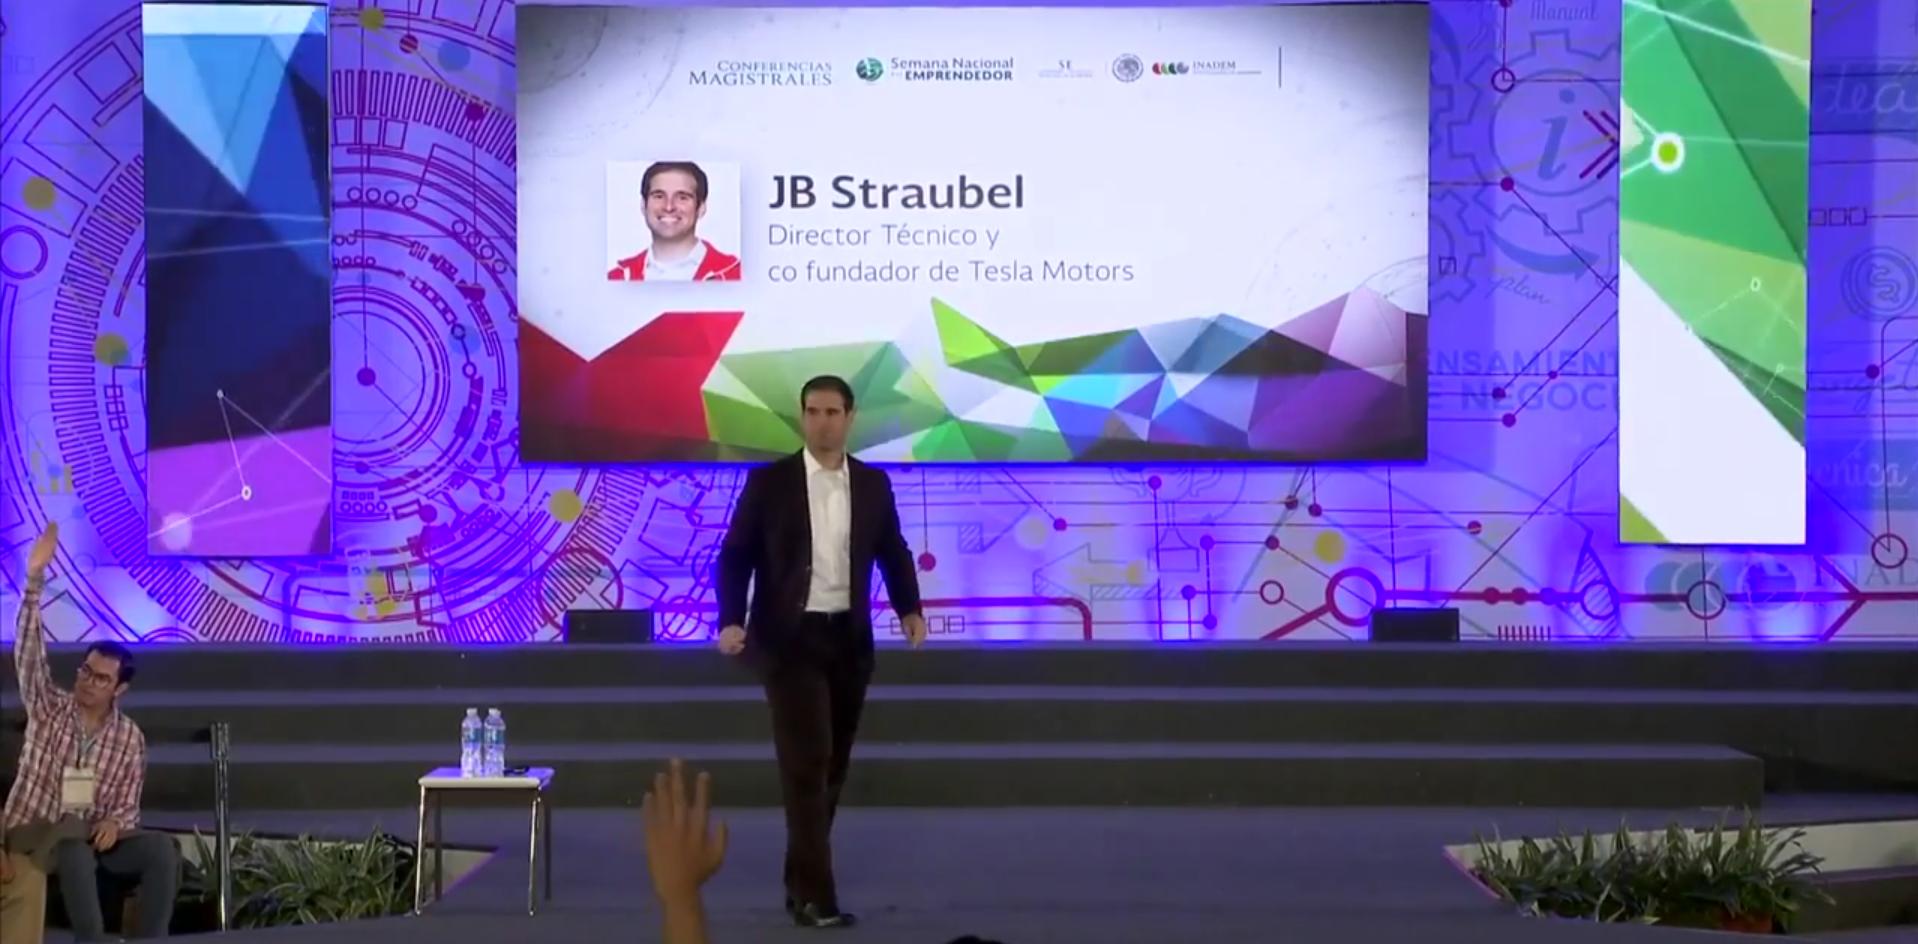 tesla-jb-straubel-presentation-oct-2016-42